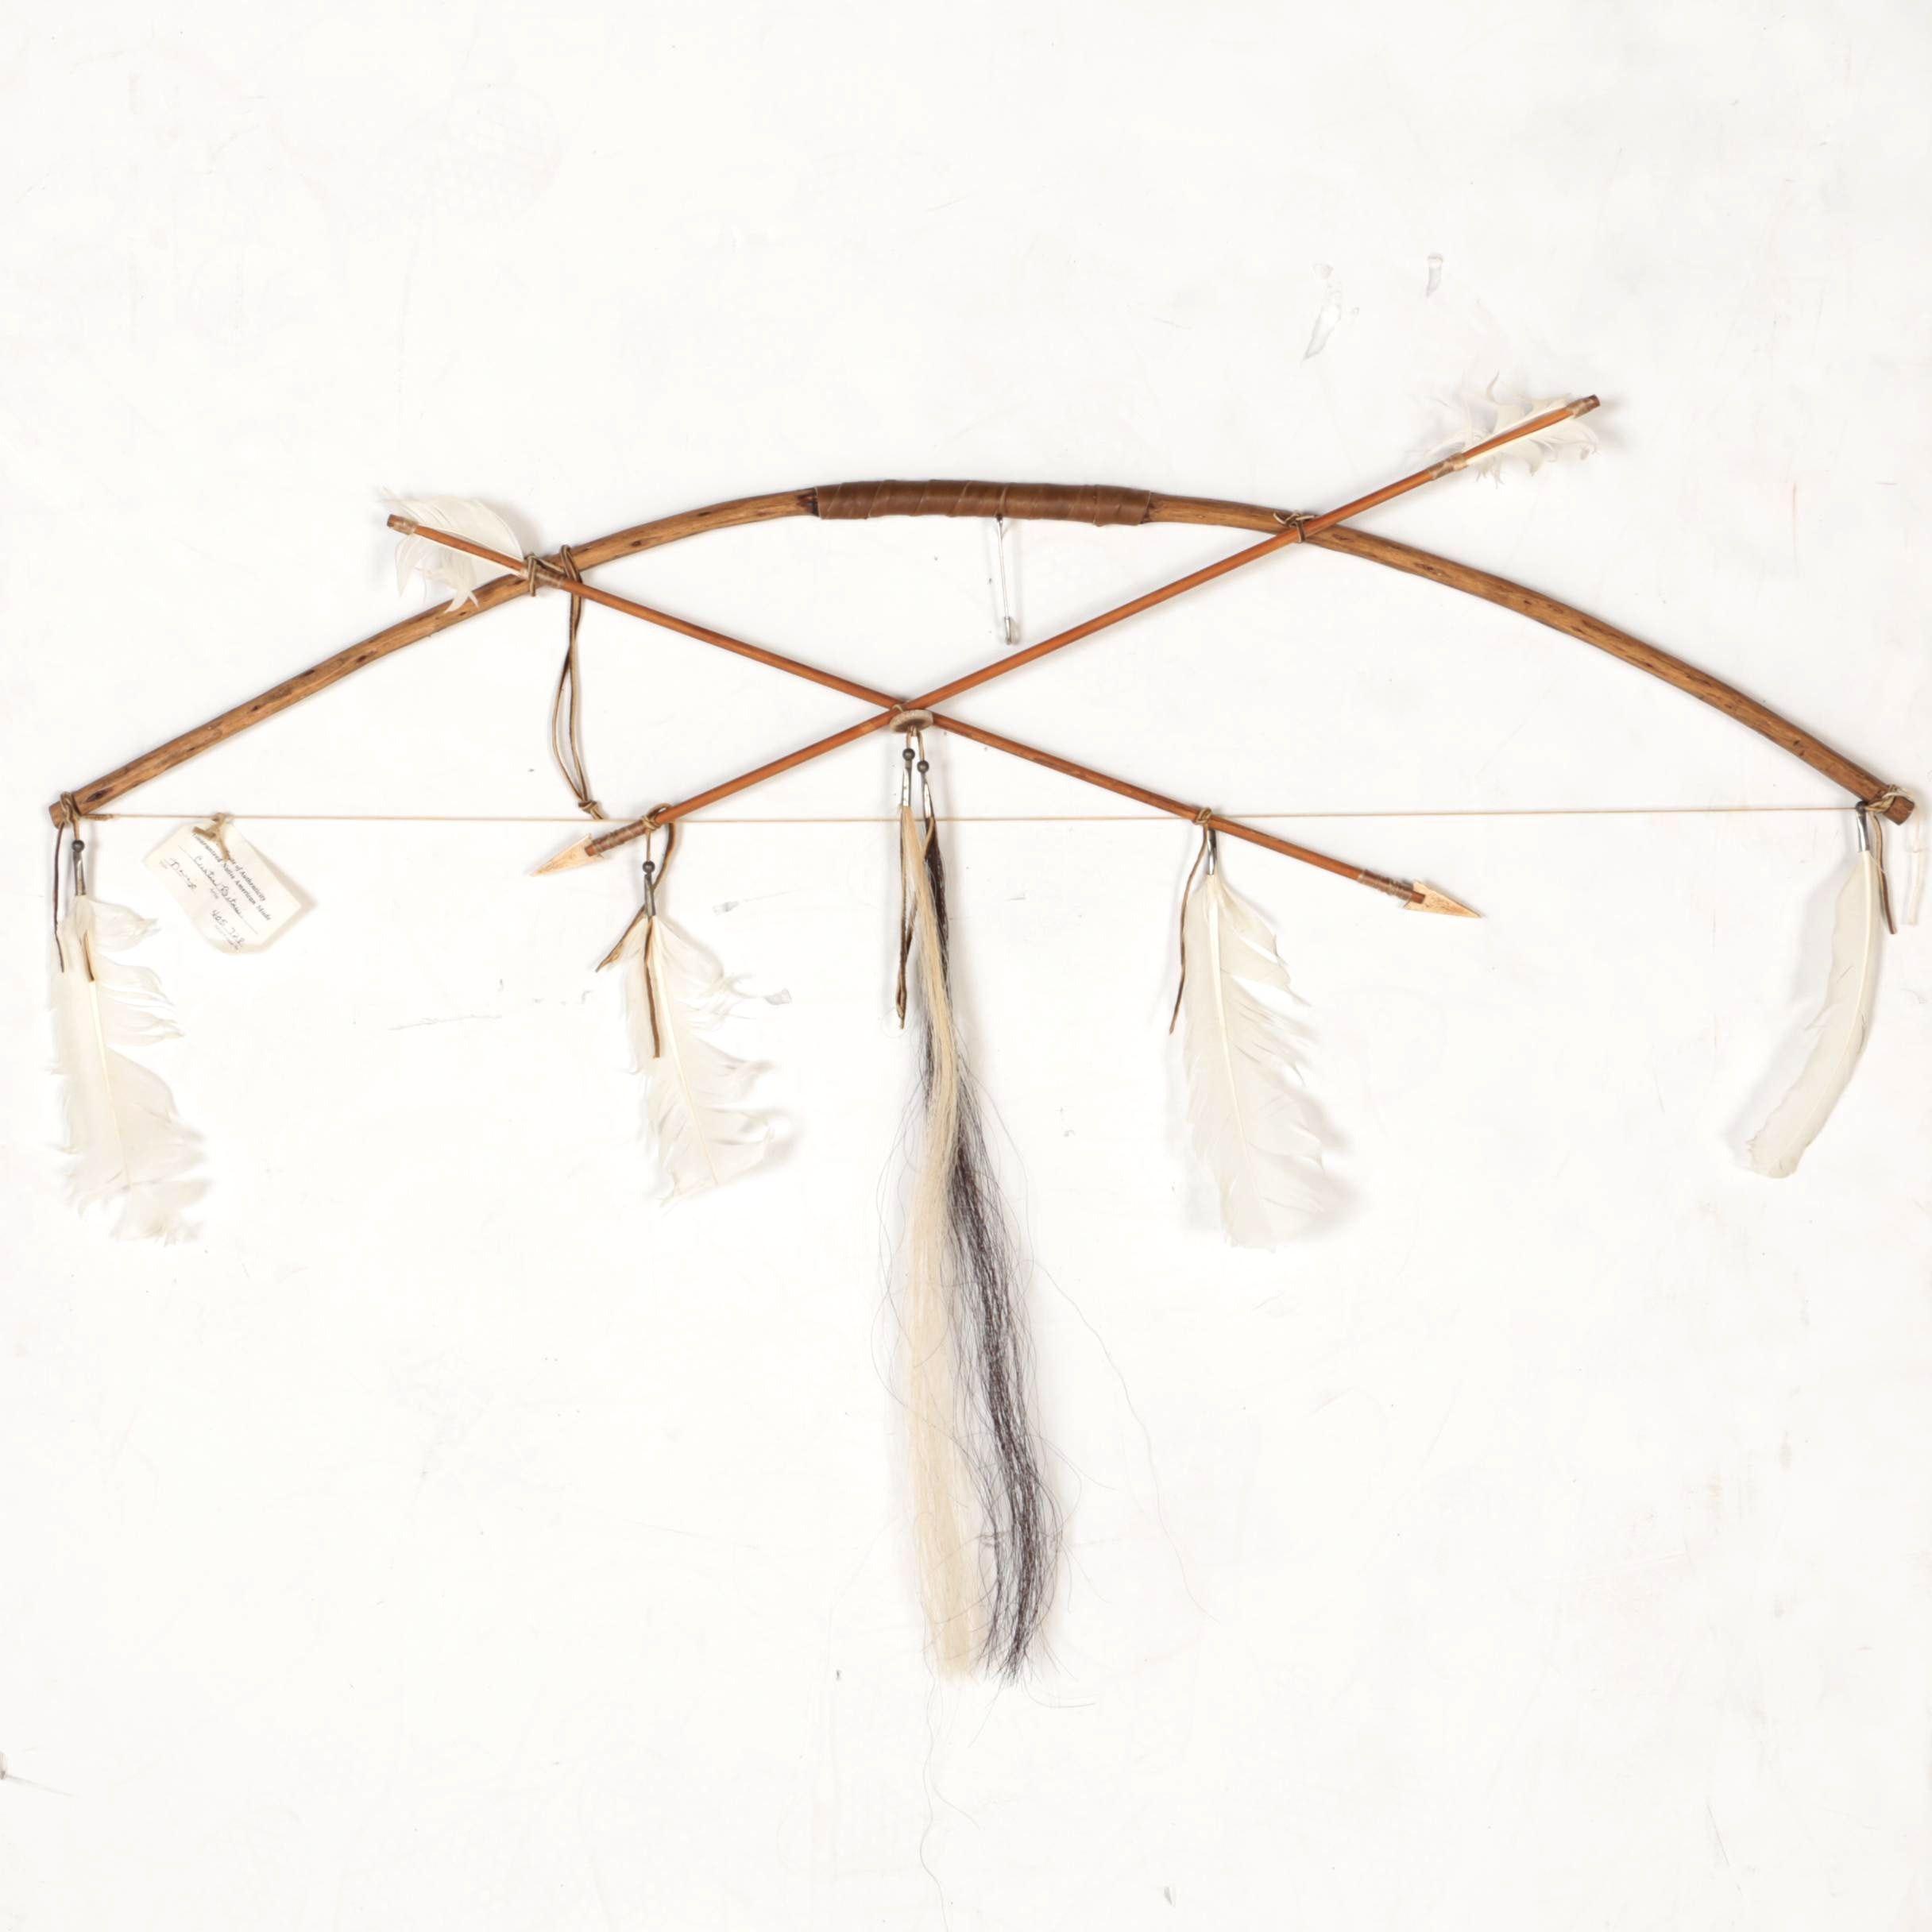 Curtis Bitsui Navajo Bow and Arrow Decor